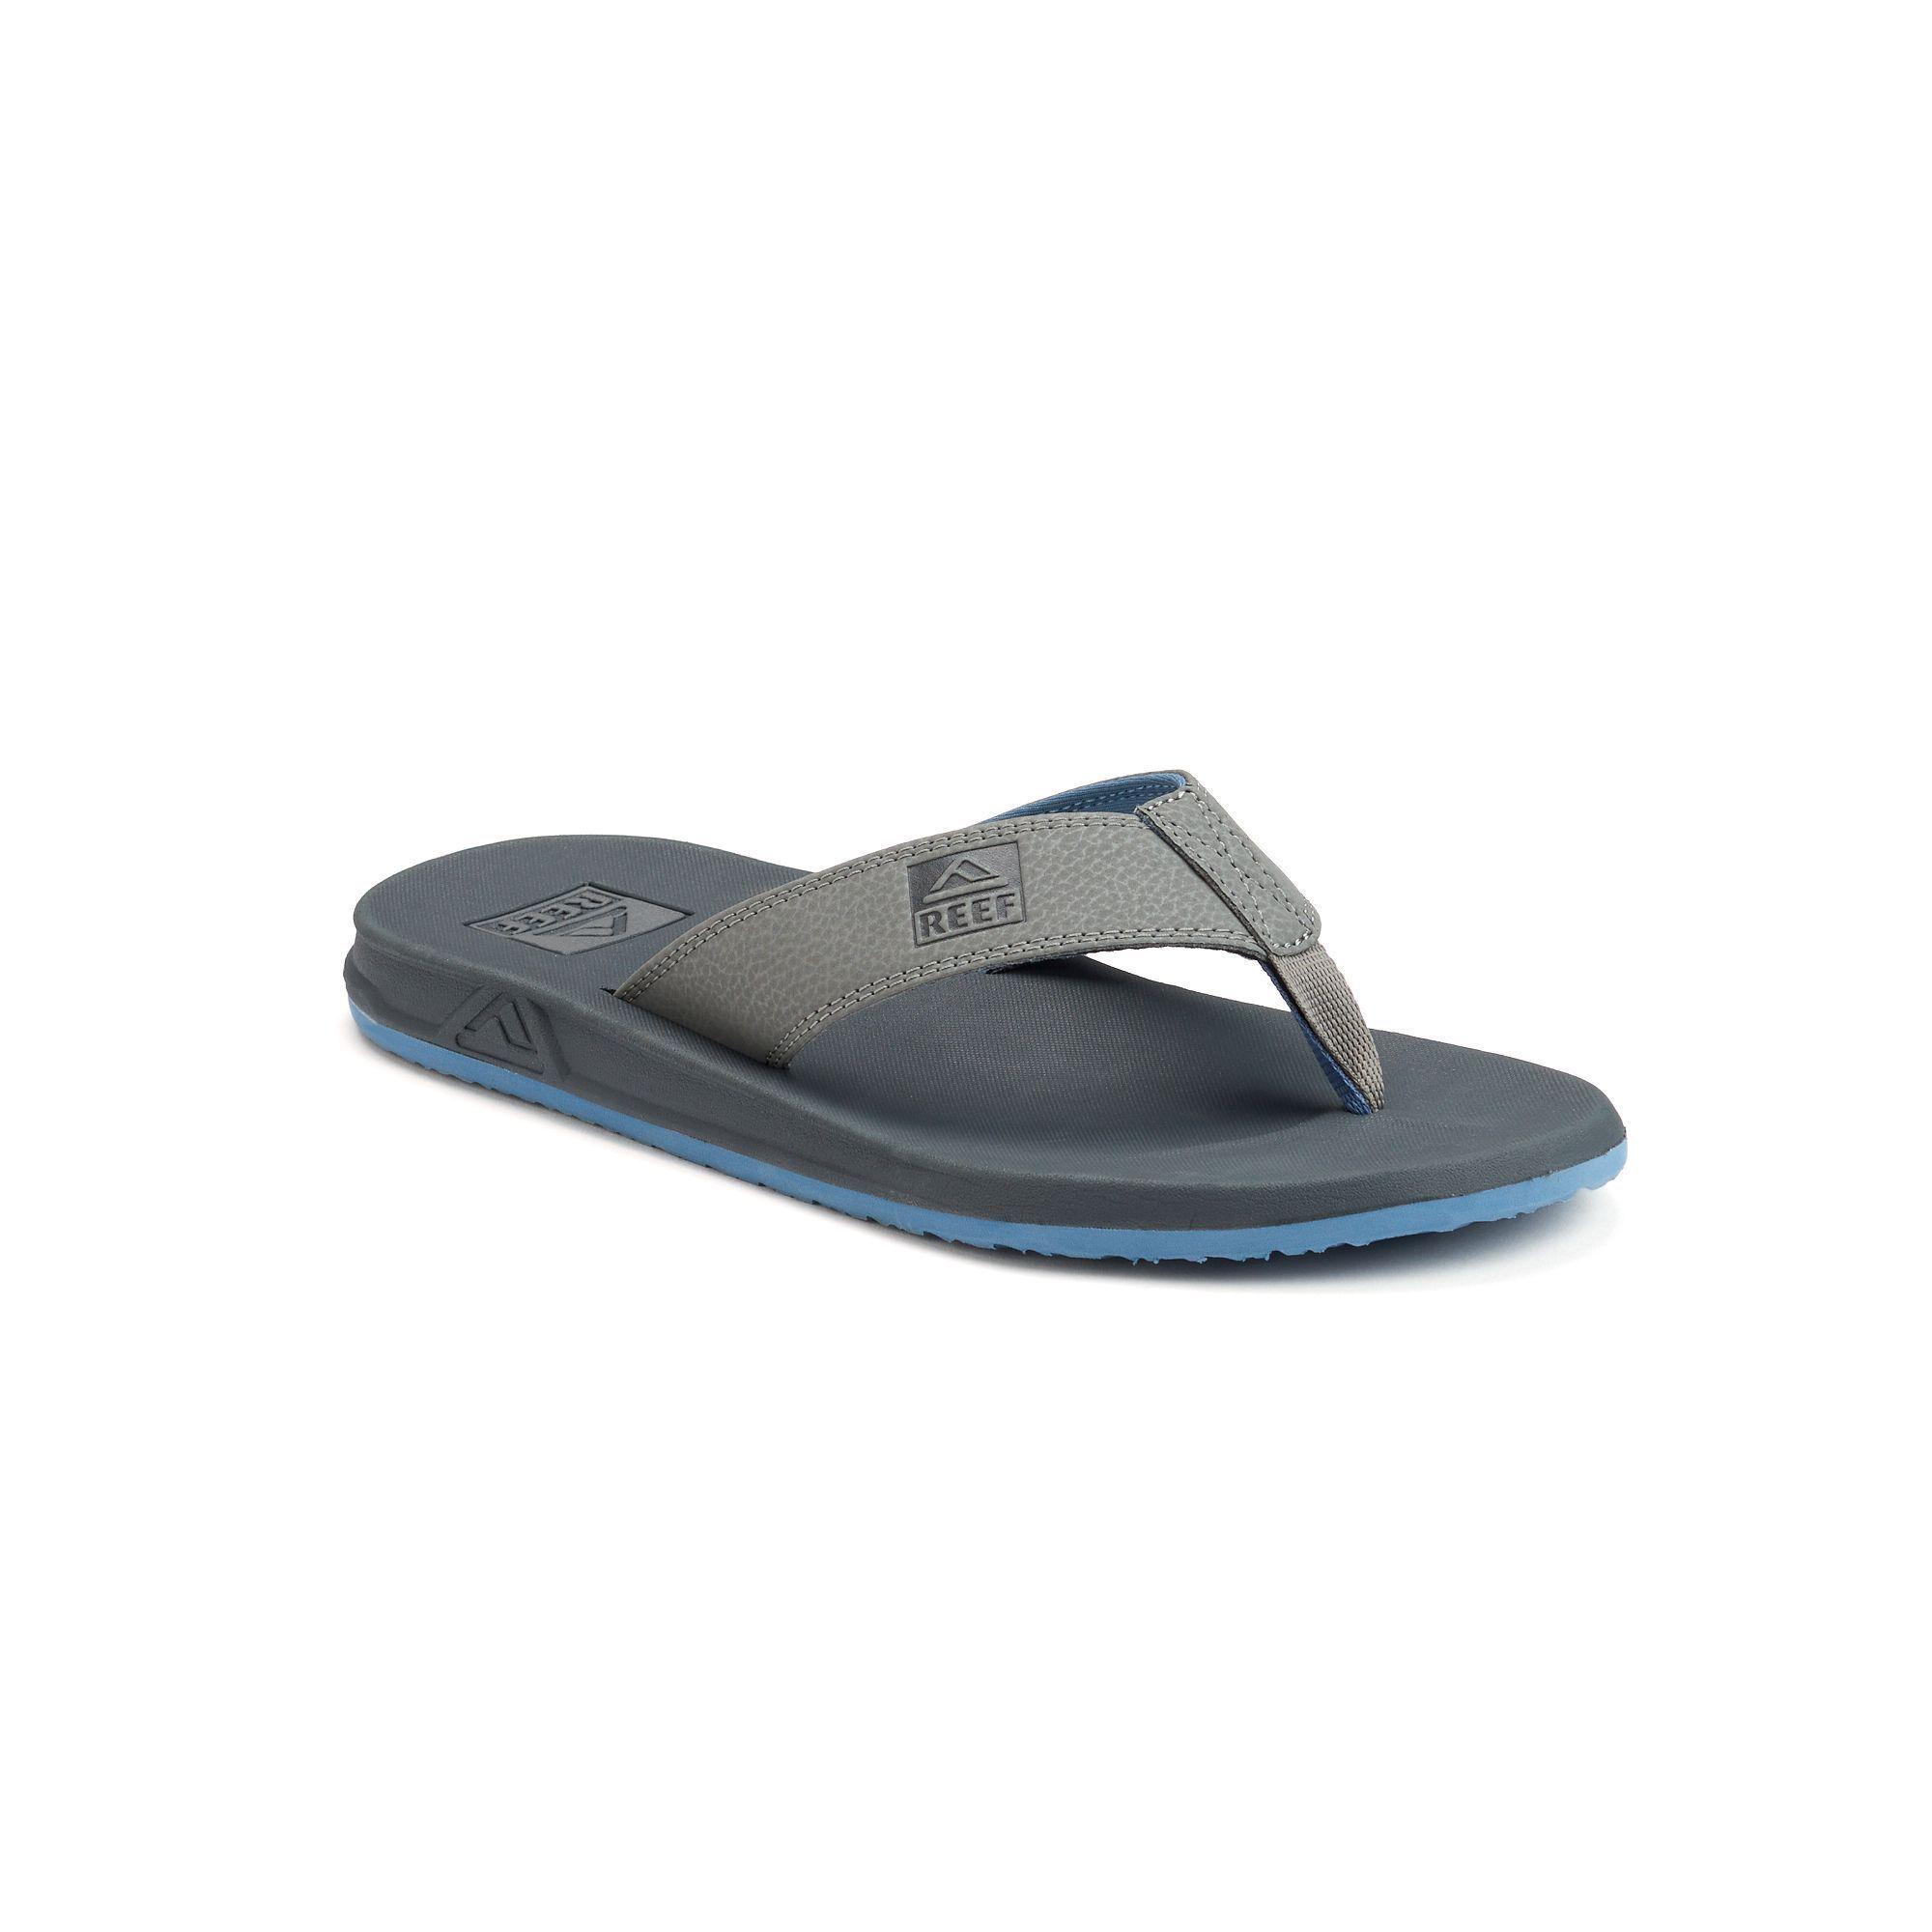 63d6545d7d0d Reef Element Men s Sandals